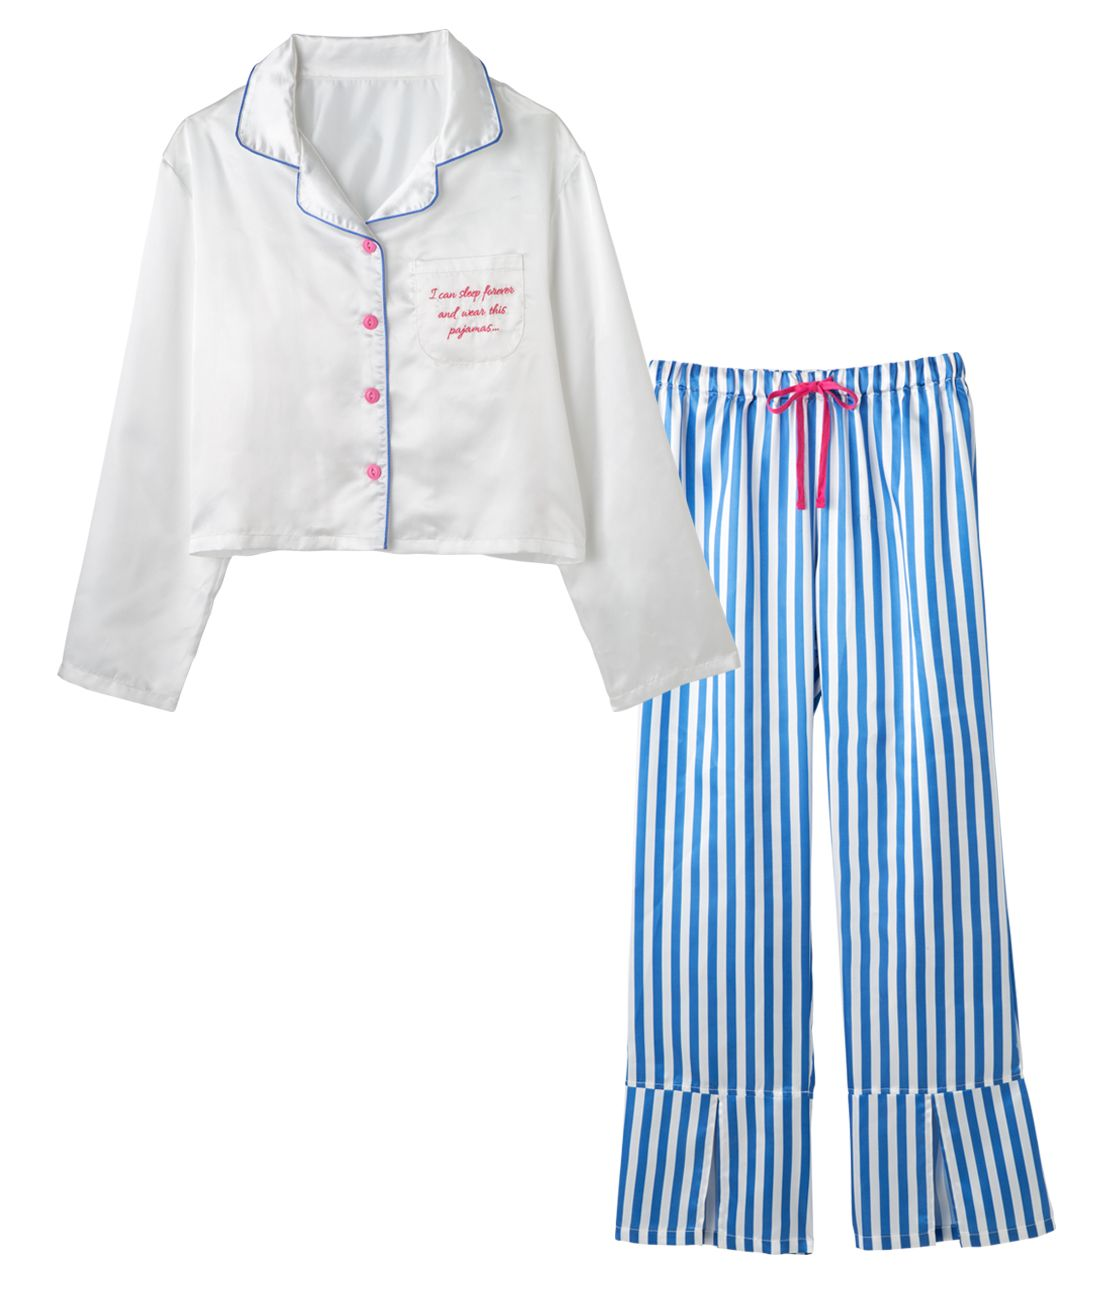 YMサテンシャツパジャマ